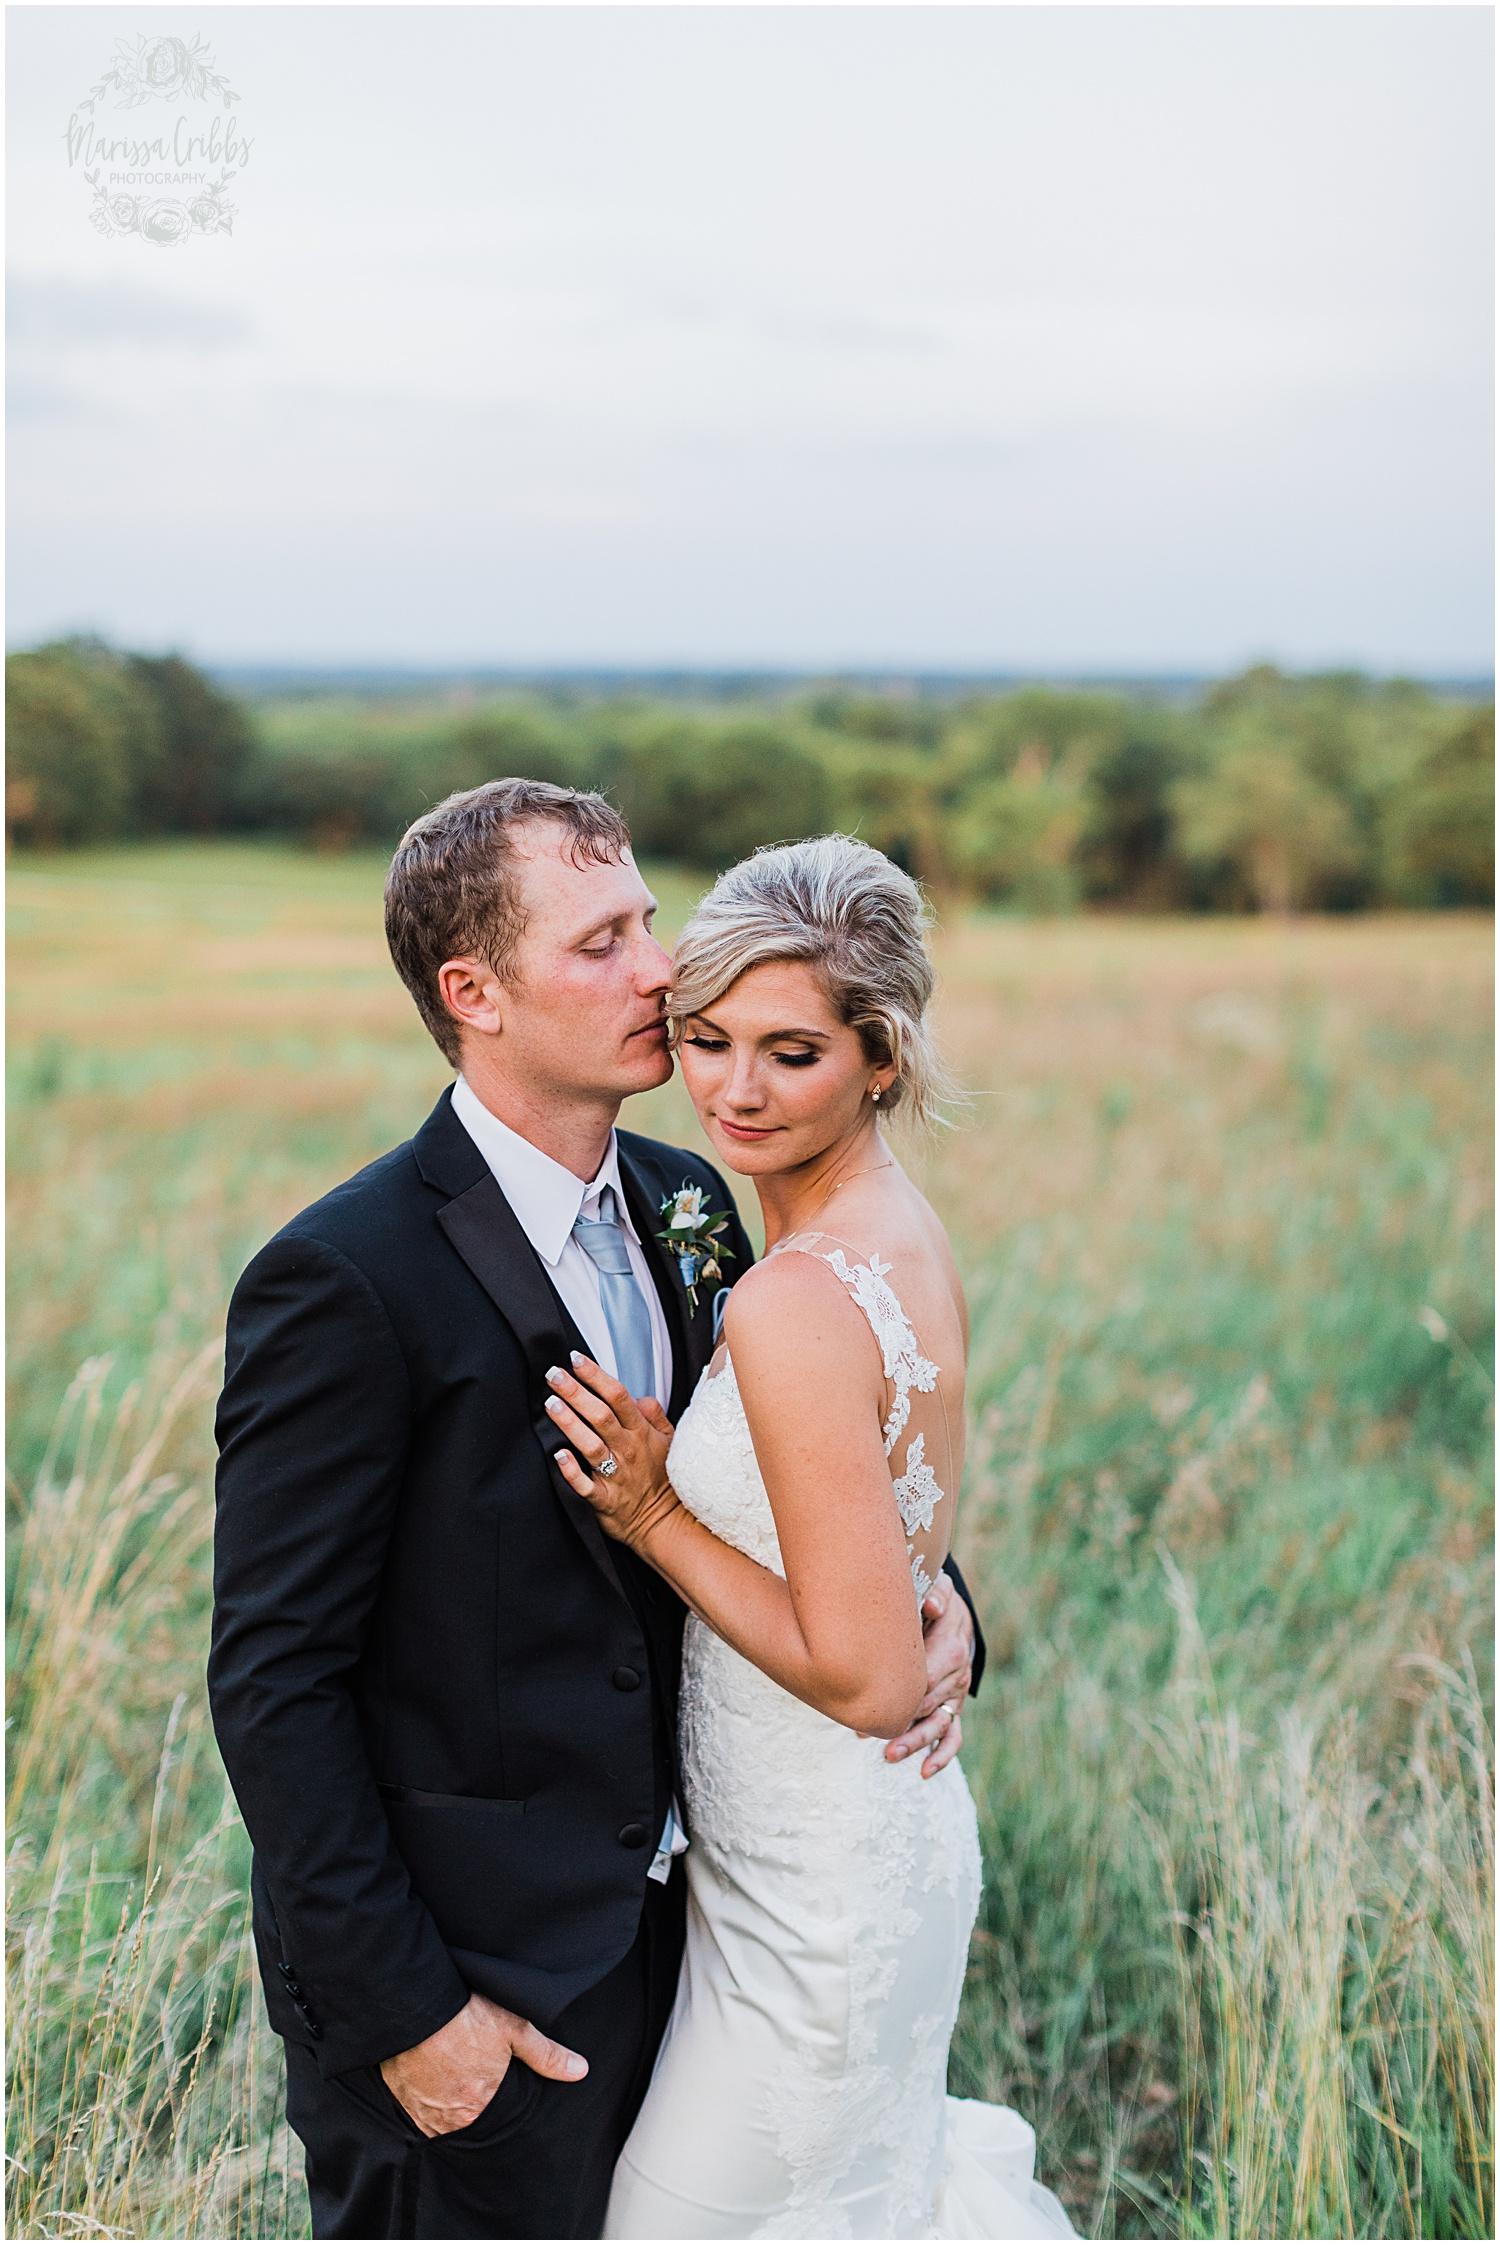 CHELSEA & BEN MARRIED BLOG  | MARISSA CRIBBS PHOTOGRAPHY_8642.jpg